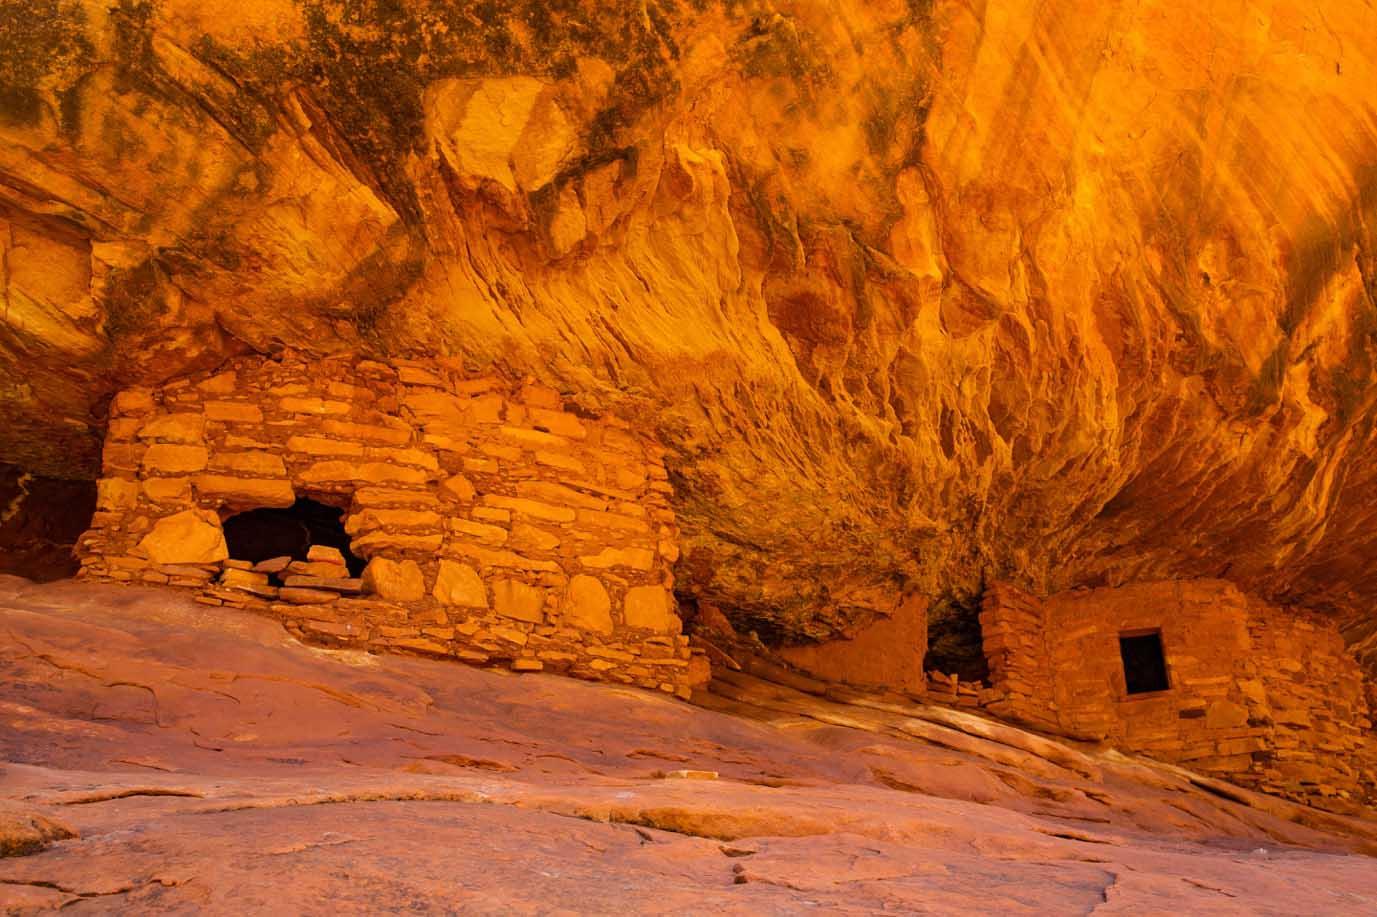 Mule Canyon: Ancestral Pueblo Village of the Anasazi